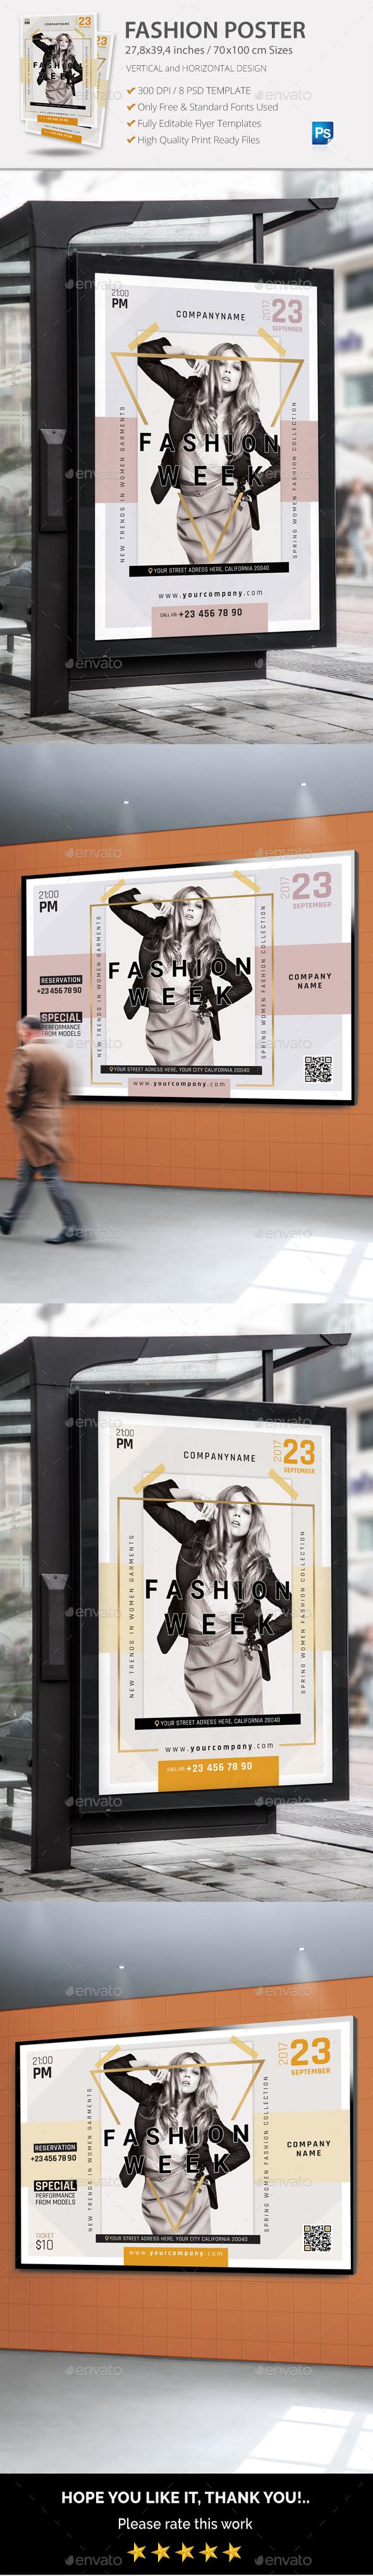 Fashion Poster - Signage Print Templates